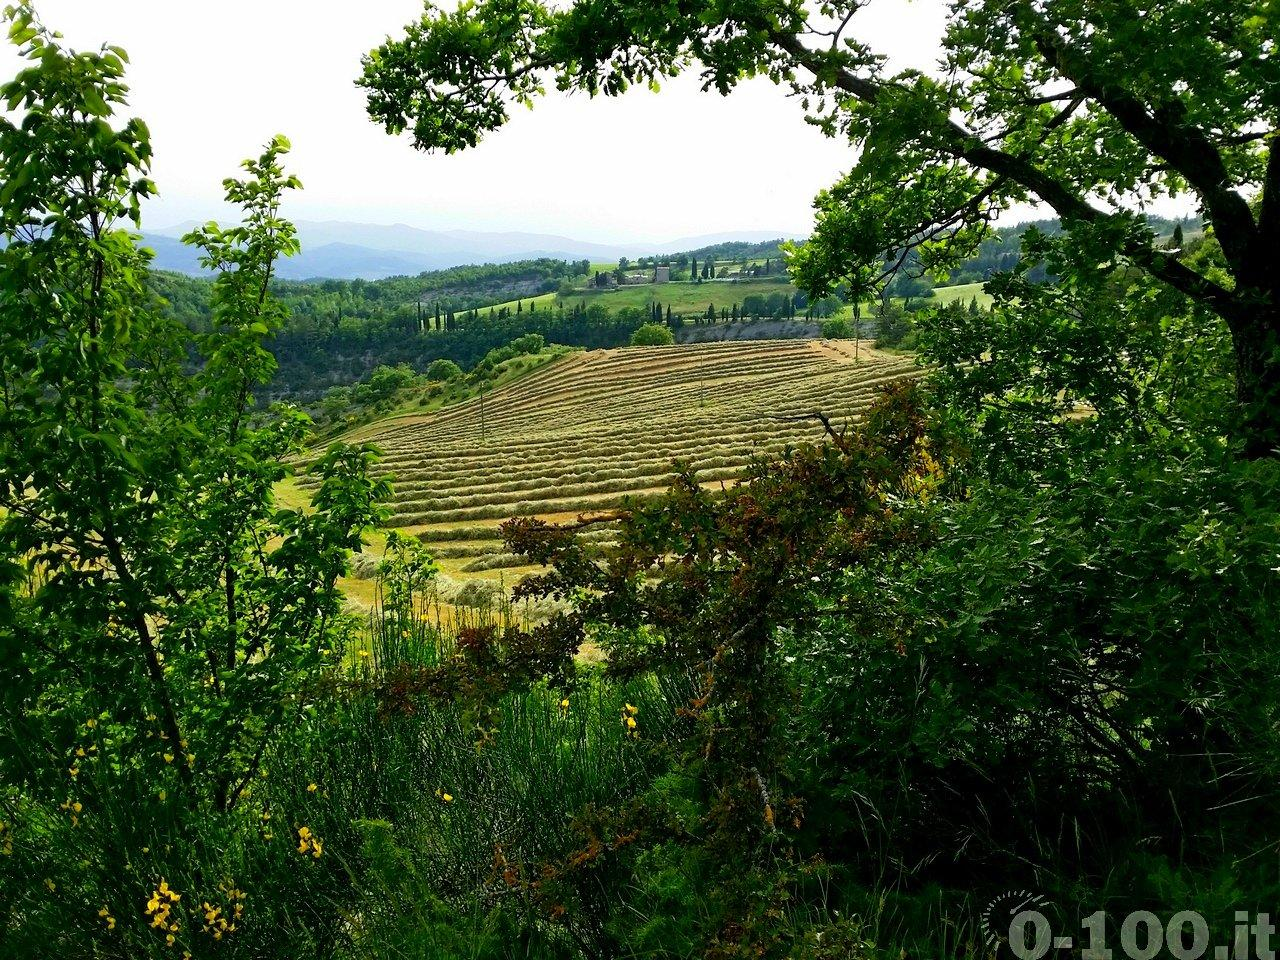 santa-felicita-paterna-turismo-umbria-agriturismo-vacanza-country-house-0-100__35